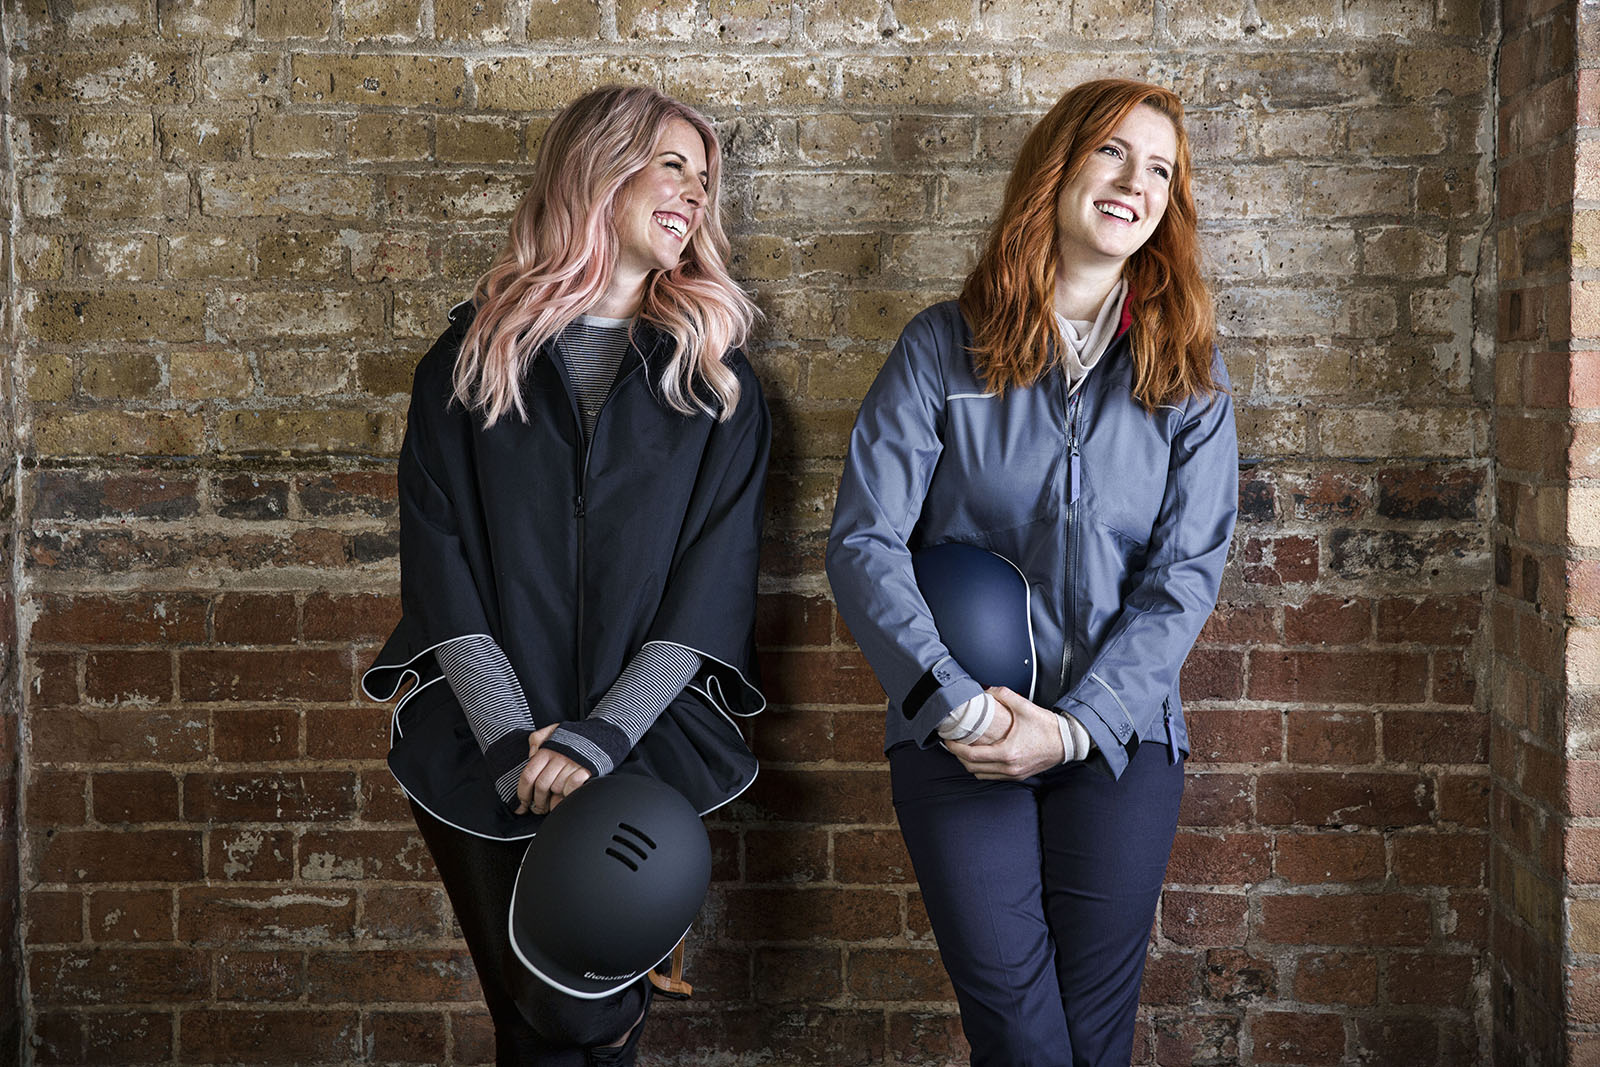 Rain poncho: Otto London - Laura Scott (left); Jess May (right)